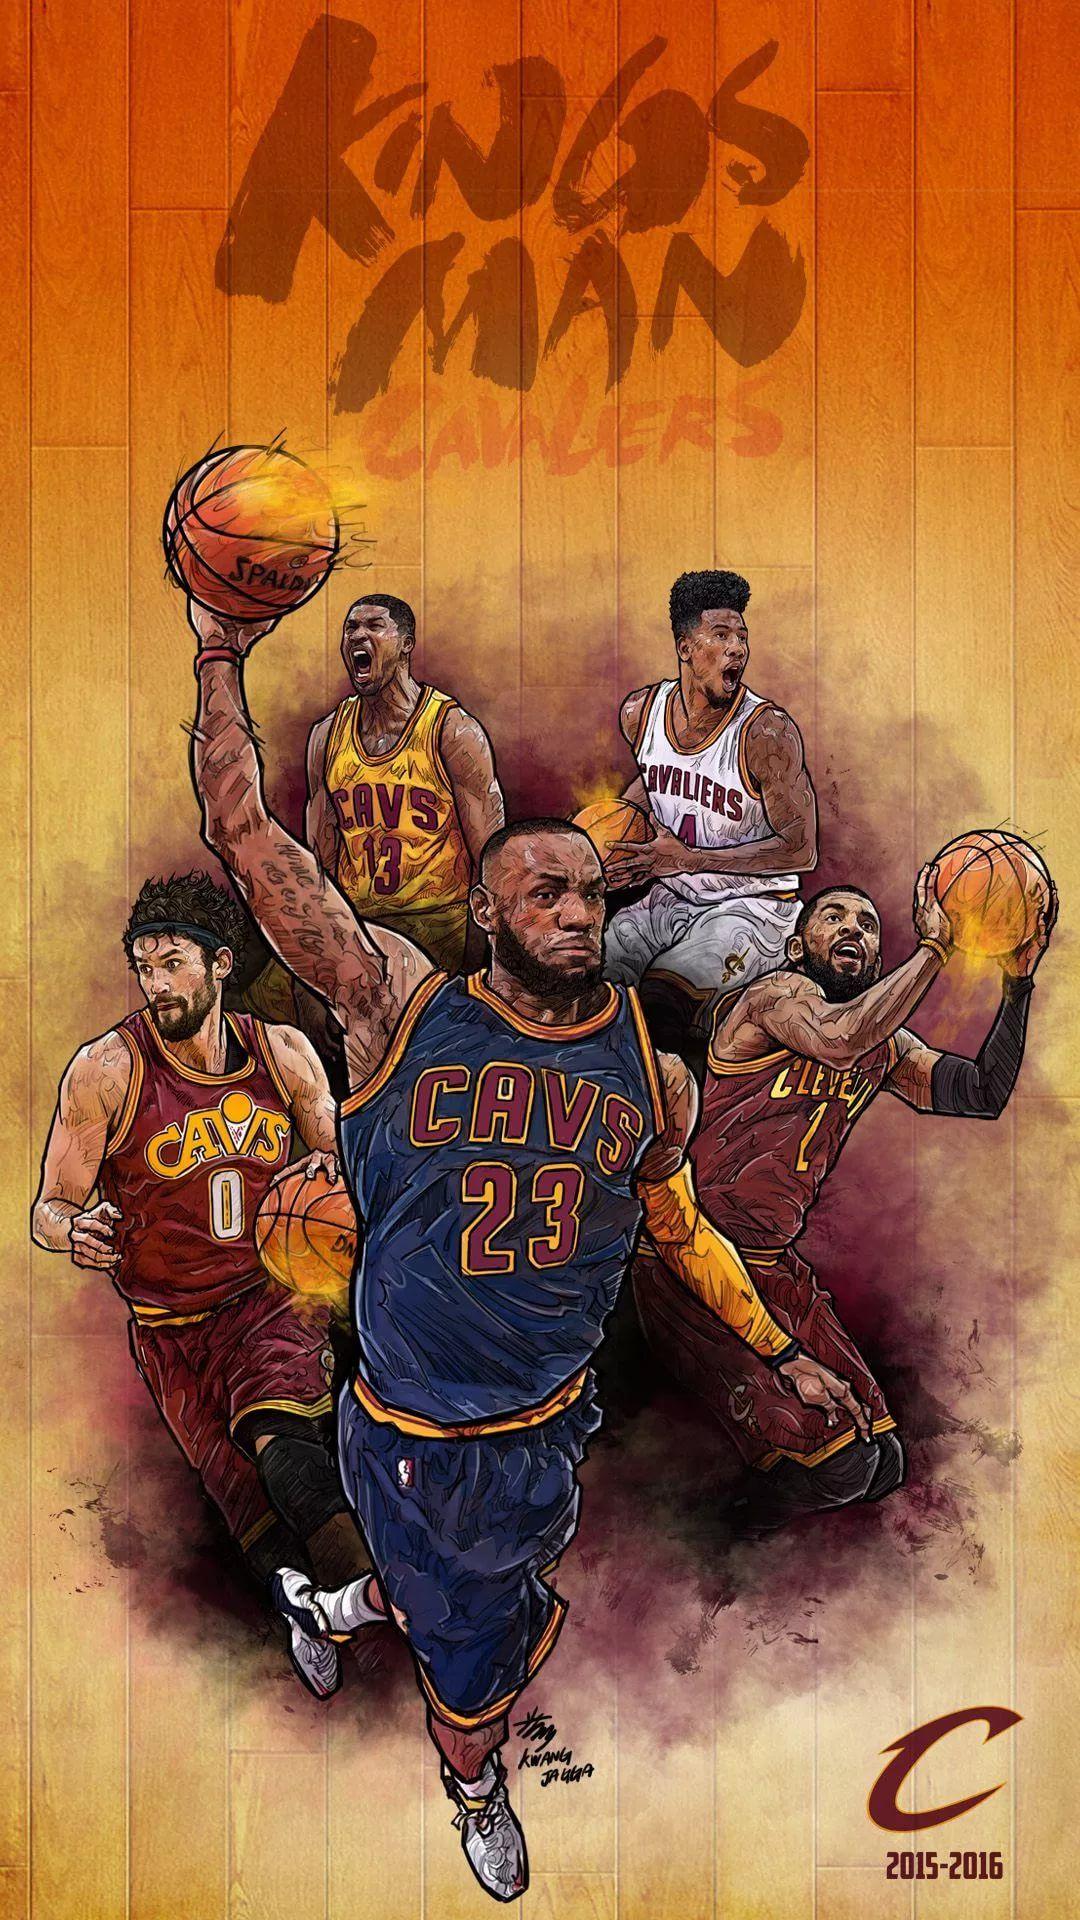 Cleveland hd phone wallpaper